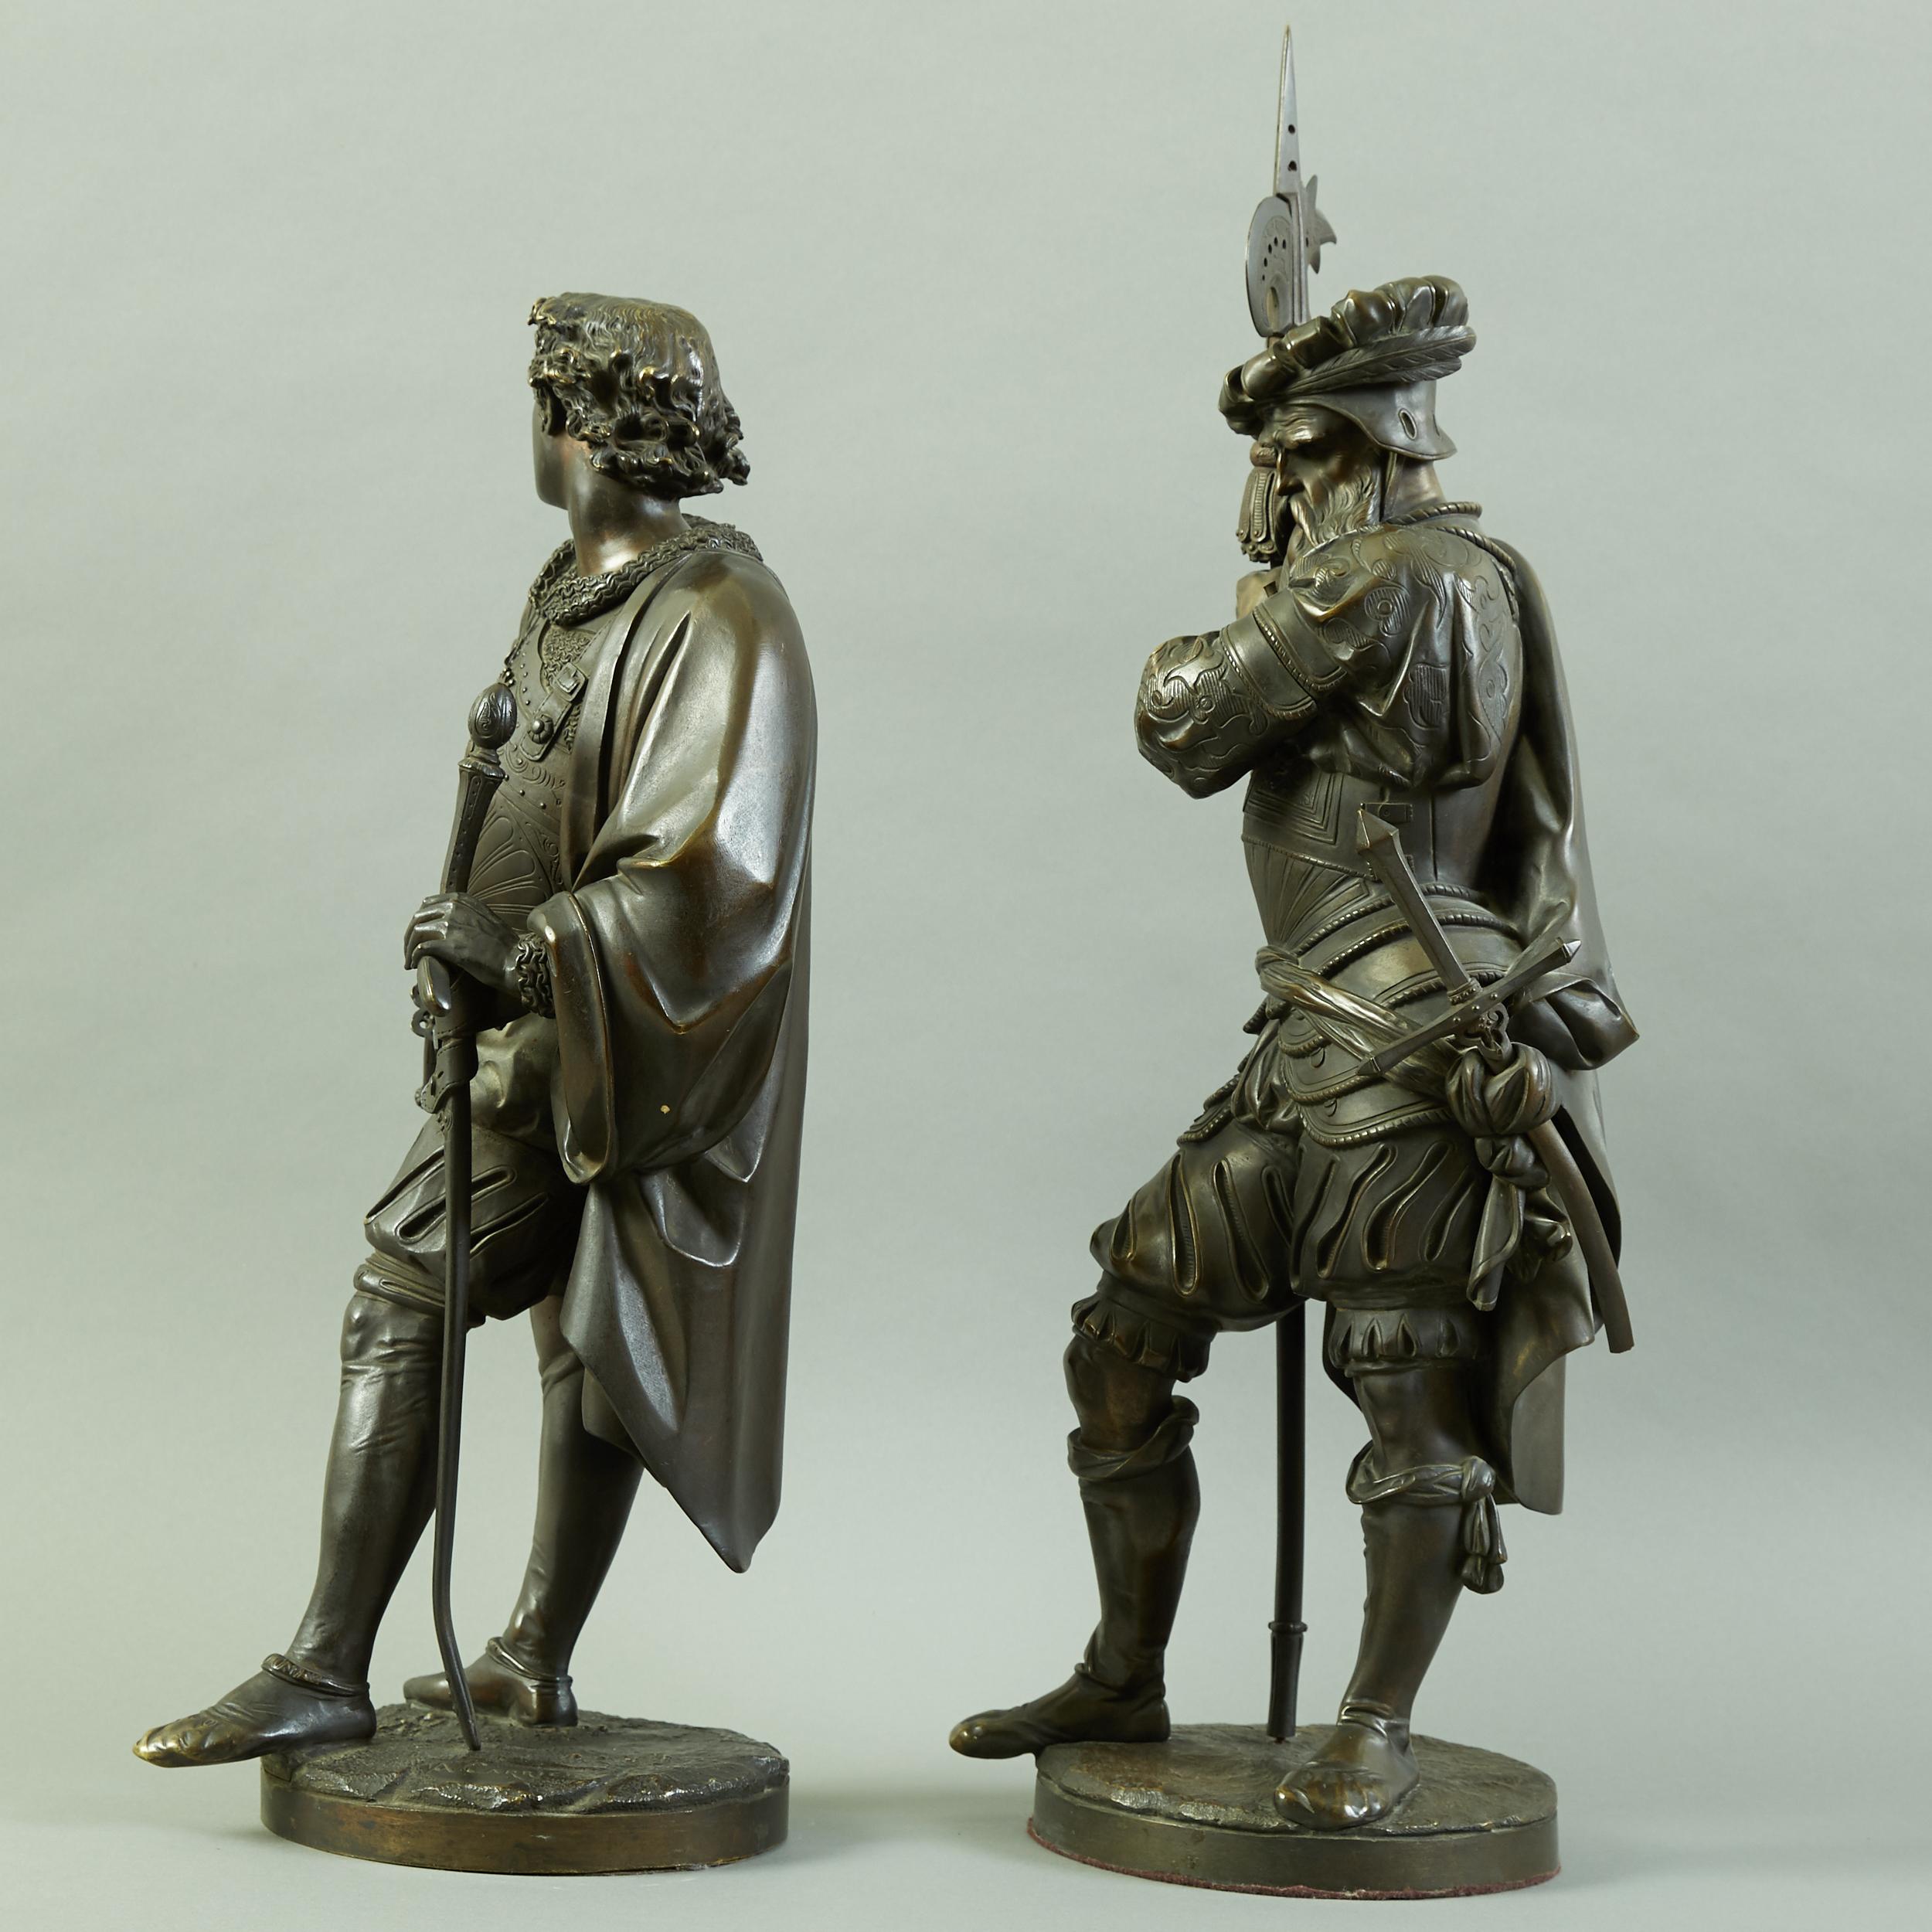 Lot 80 - Pair of Large Auguste Carrier Bronze Sculptures